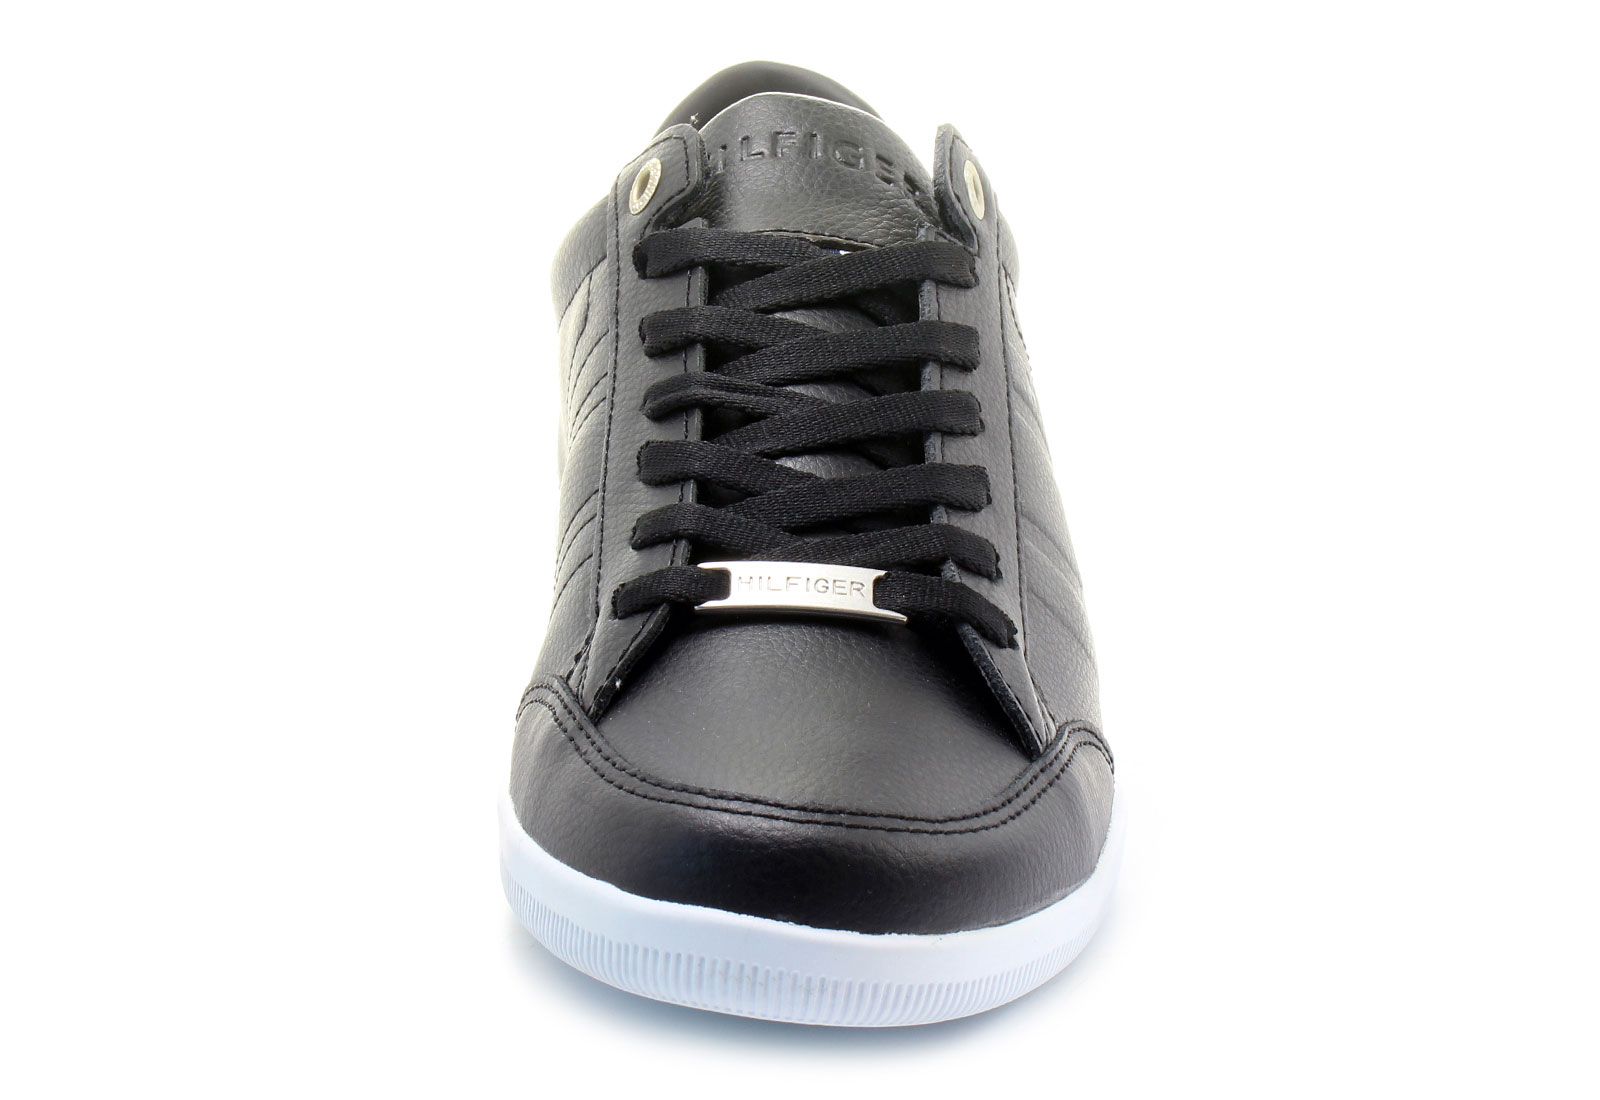 cd5be0fa60 Tommy Hilfiger Cipő - Denzel 8a - 16F-1502-990 - Office Shoes ...